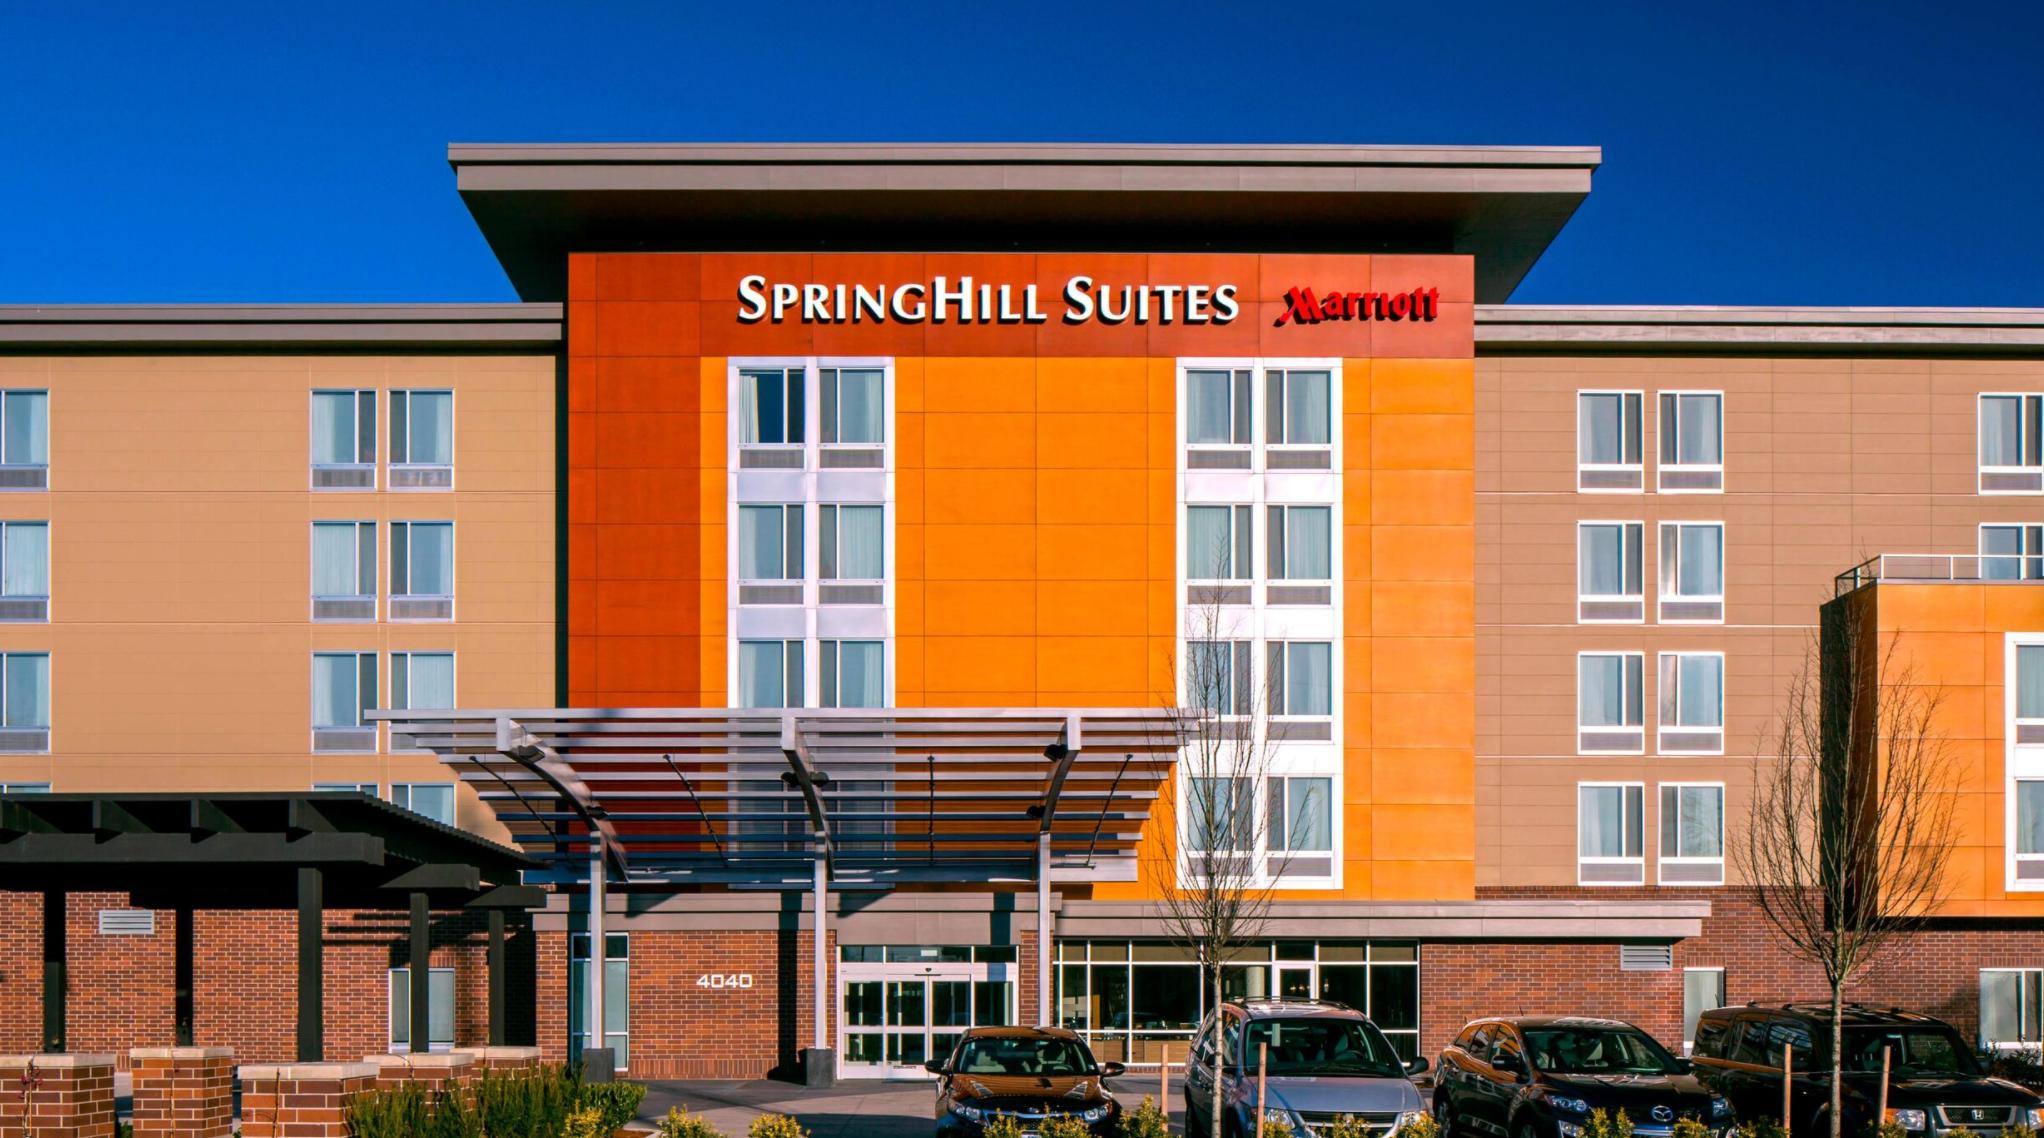 https://www.hotelsbyday.com/_data/default-hotel_image/4/22000/screenshot-2020-09-20-at-9-21-05-pm.png